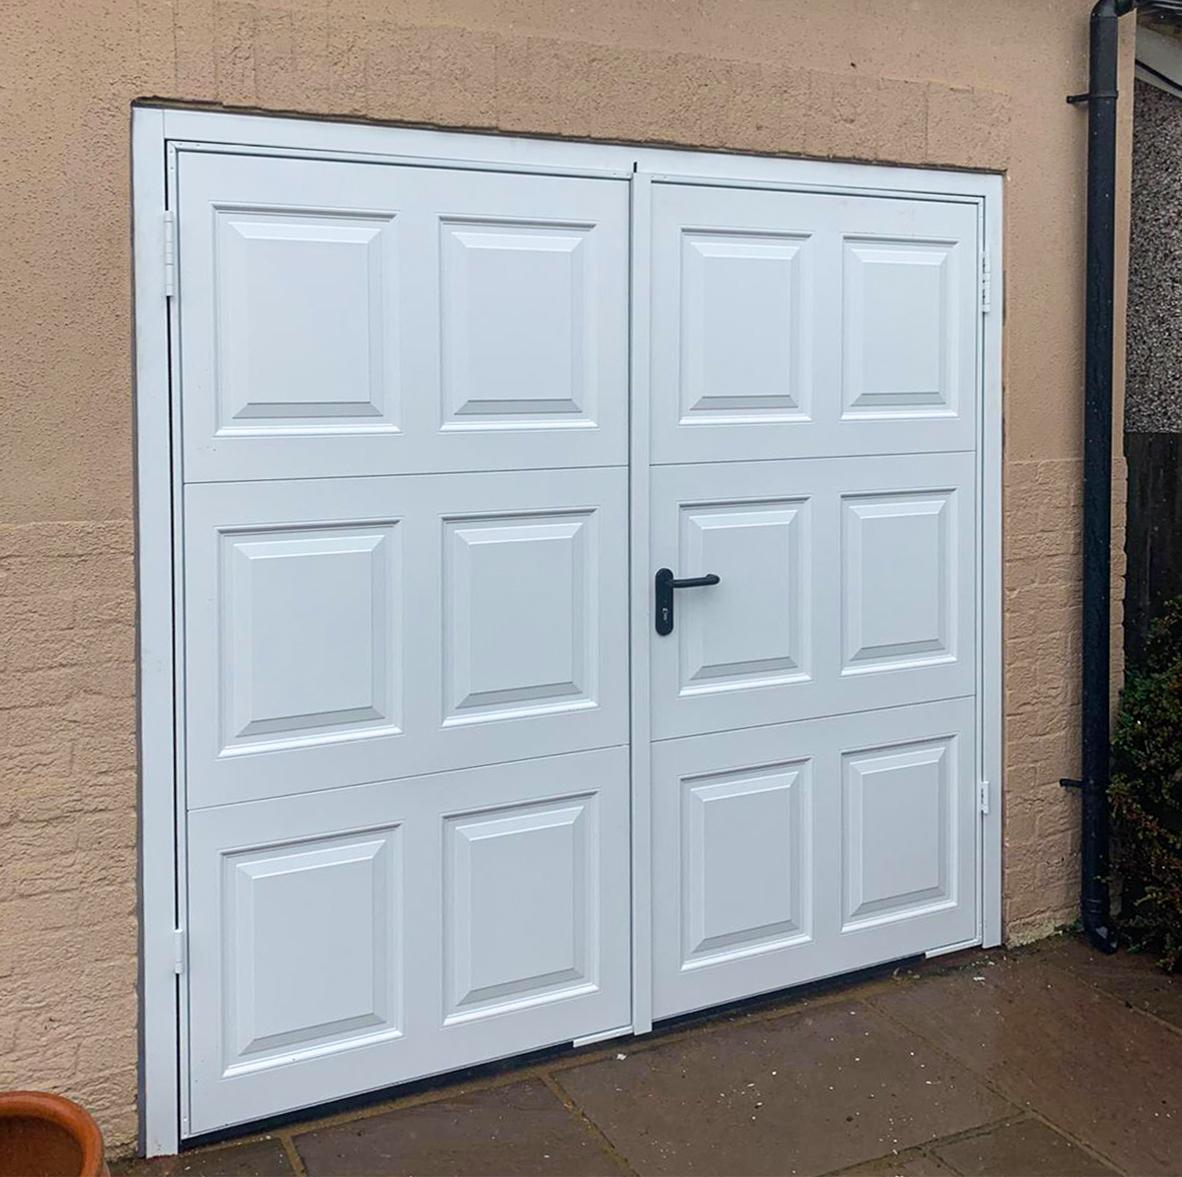 Garador Georgian Side Hinged Steel Garage Door Finished in White